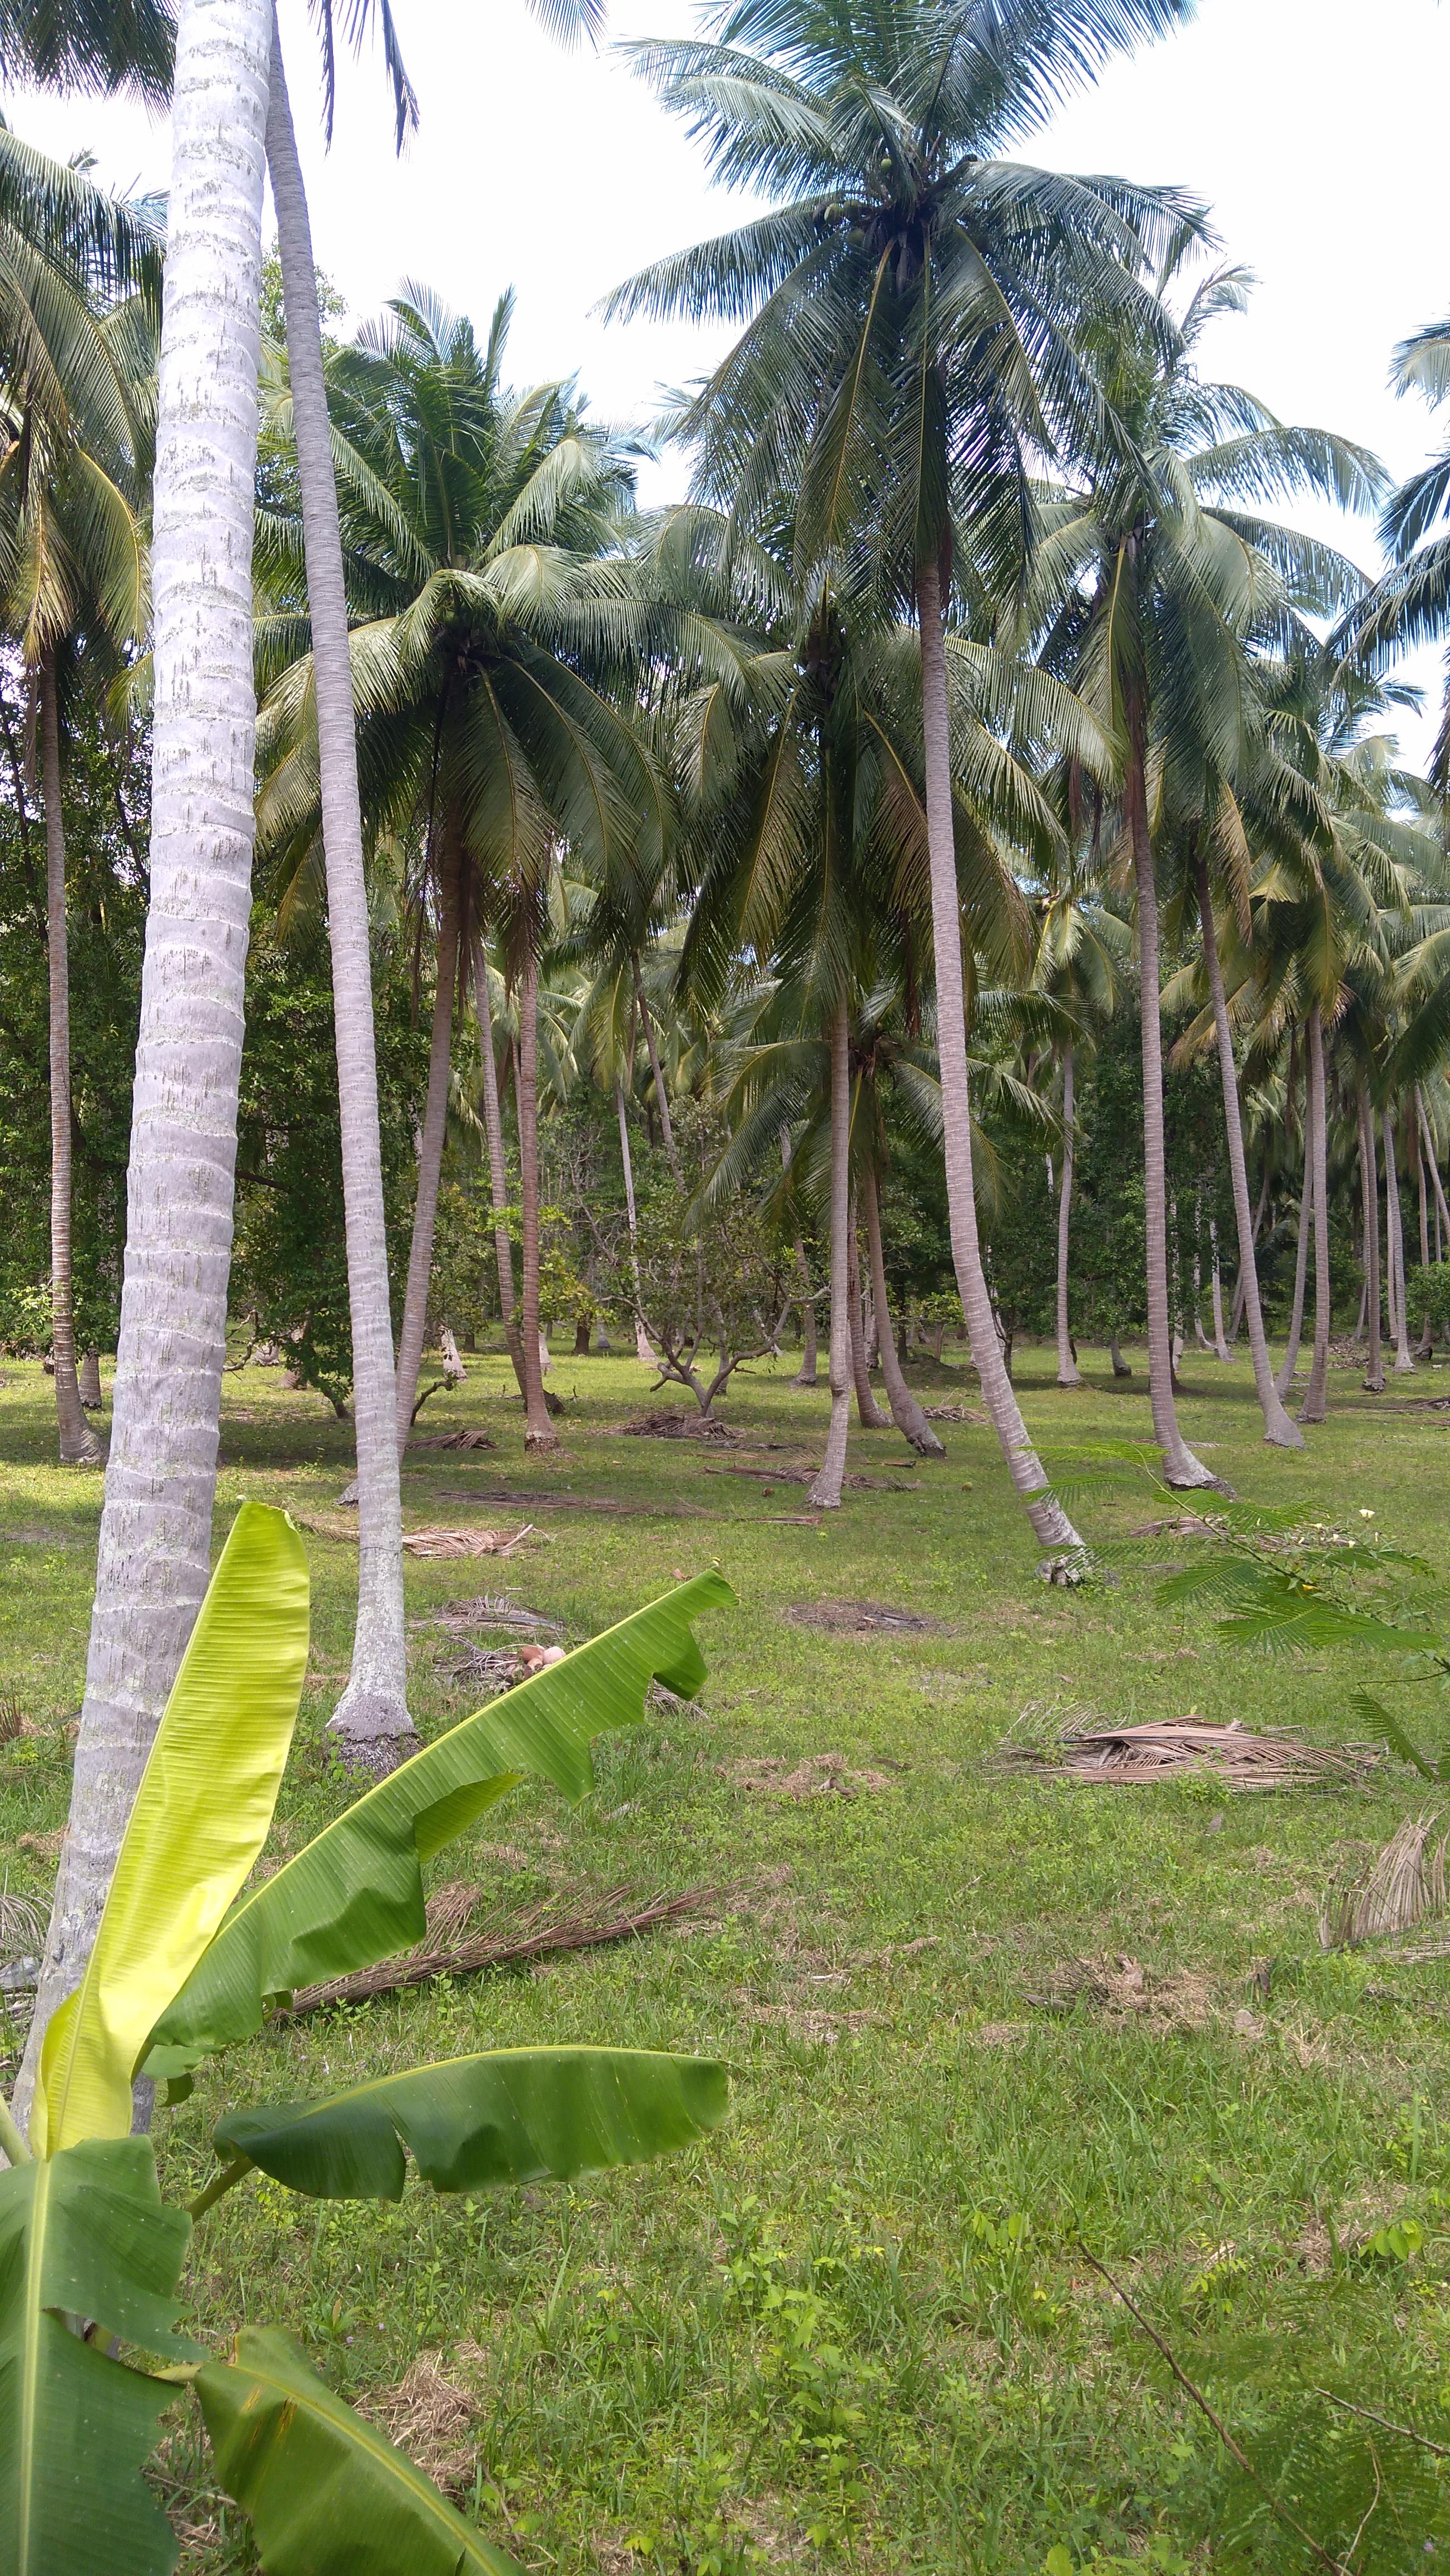 Kokosove palme